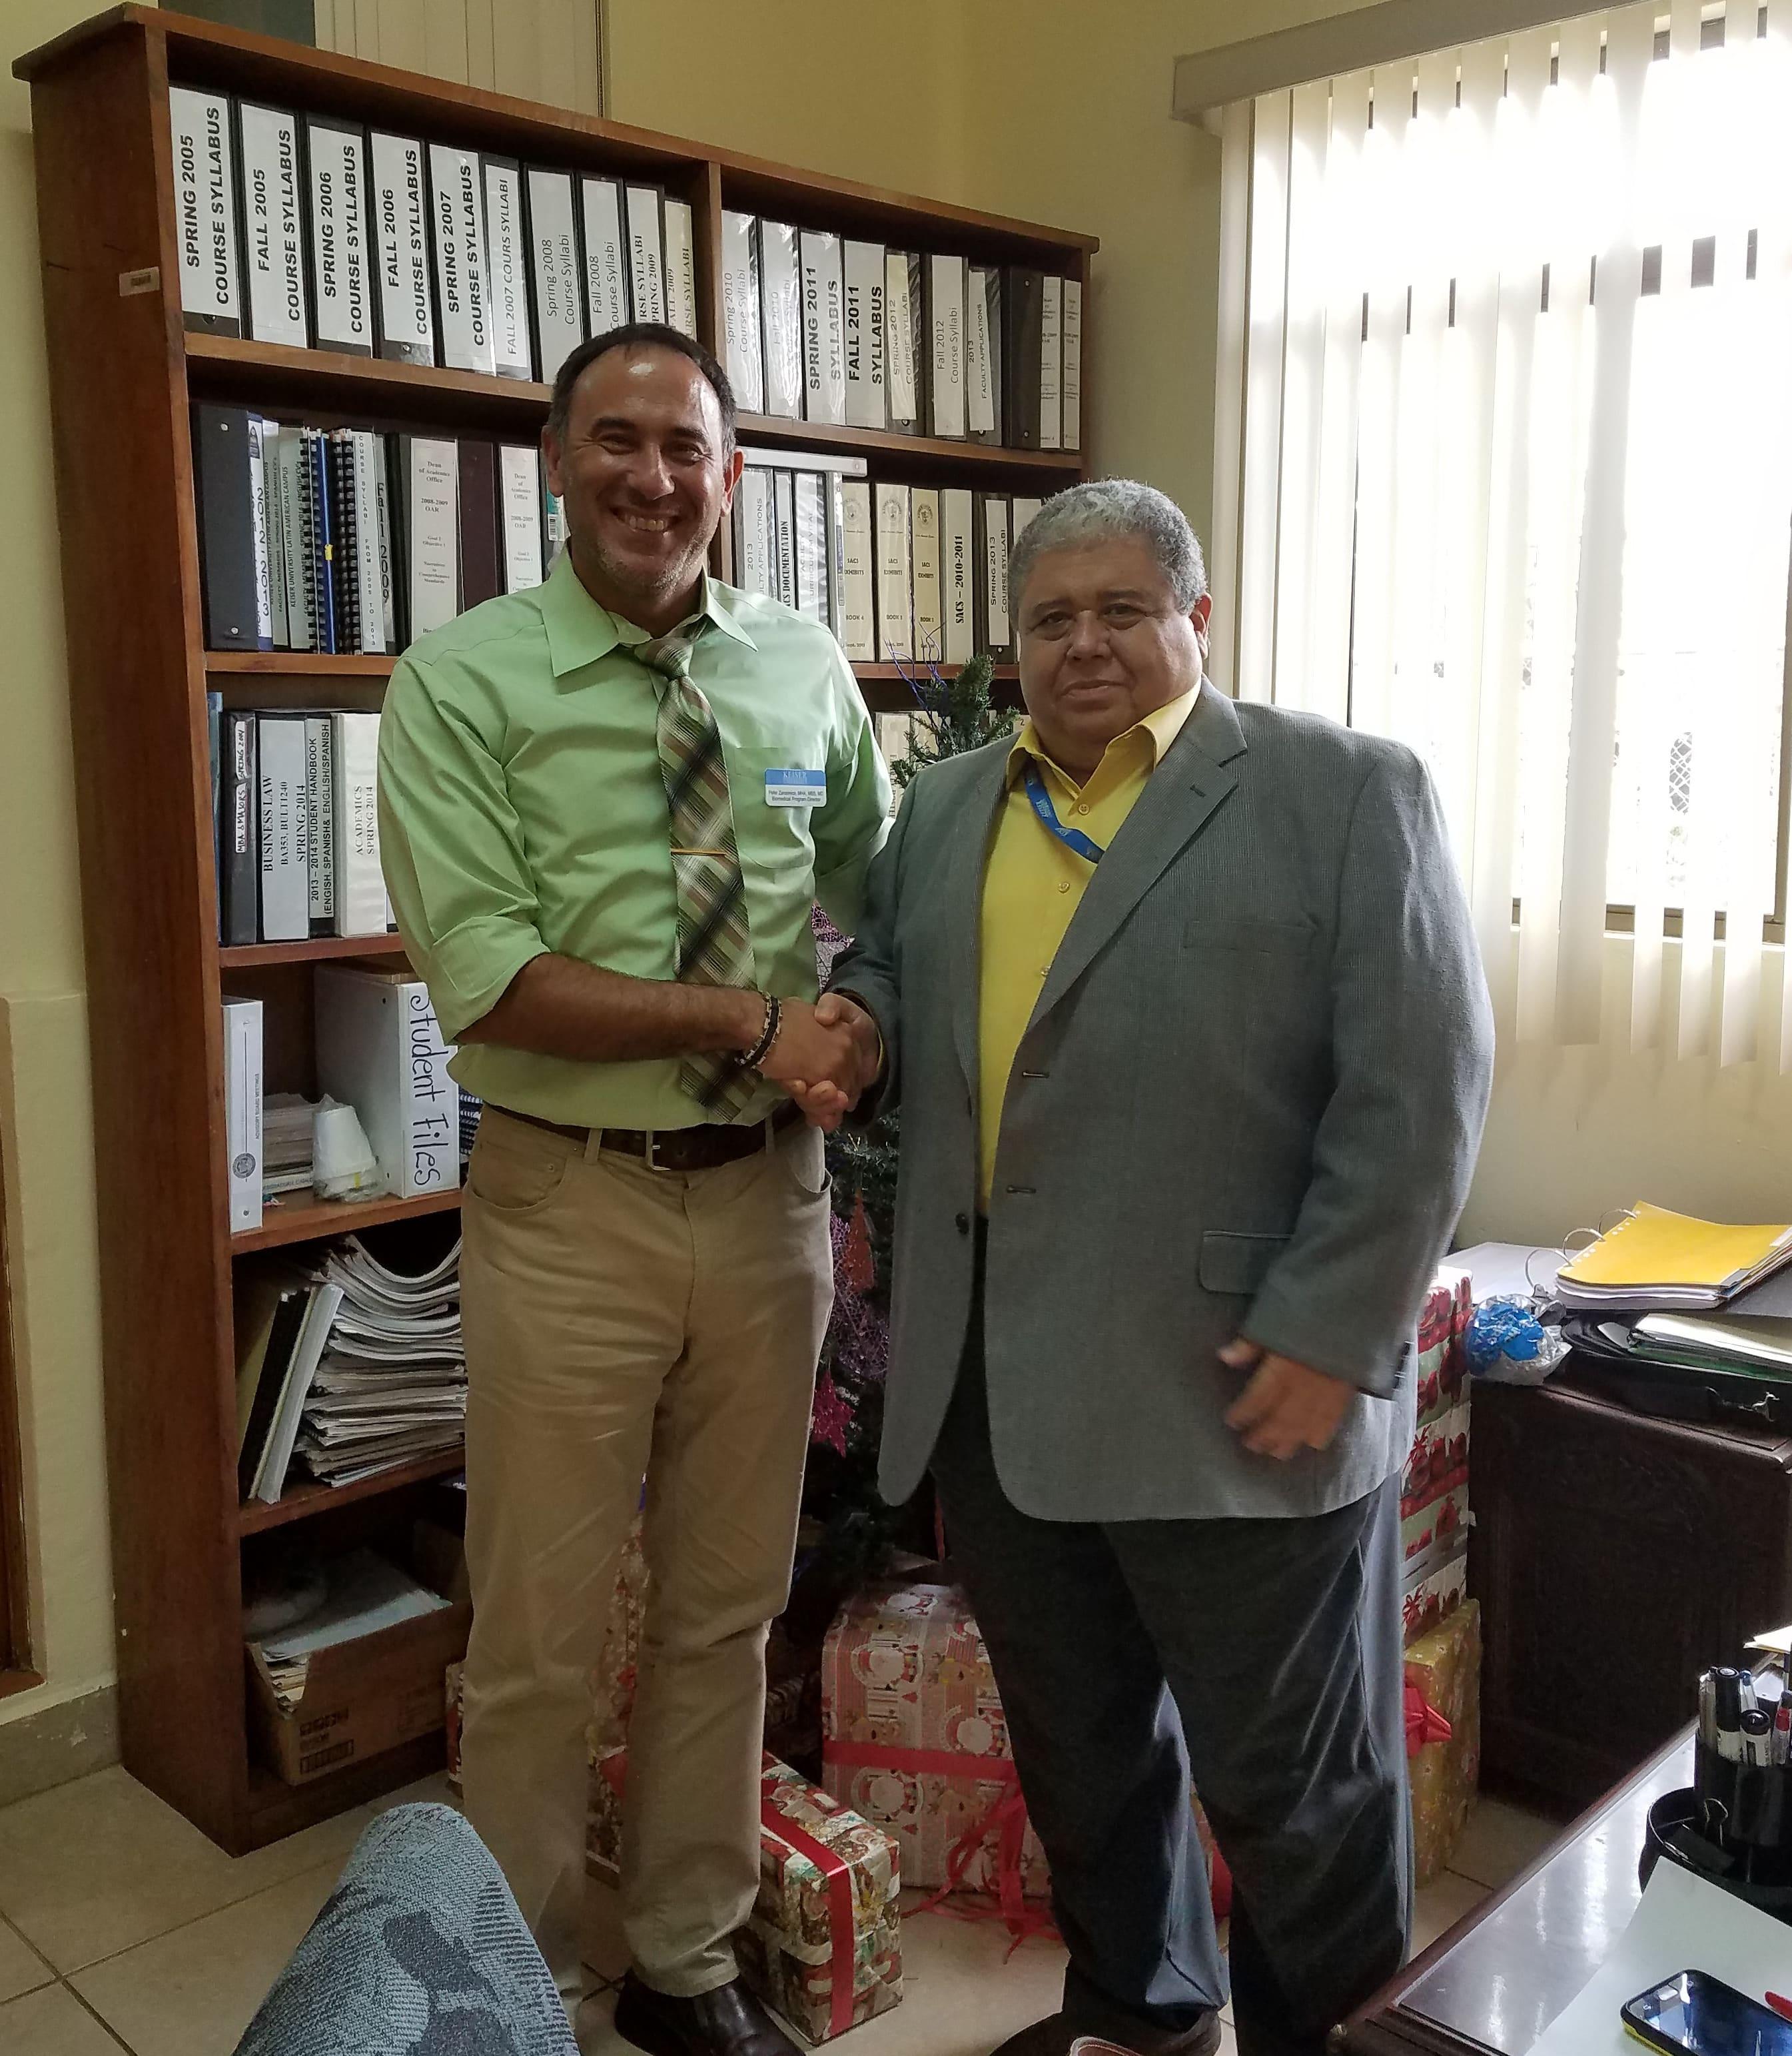 Jacksonville's Biomedical Sciences Program Director Visits Keiser University's Latin America Campus